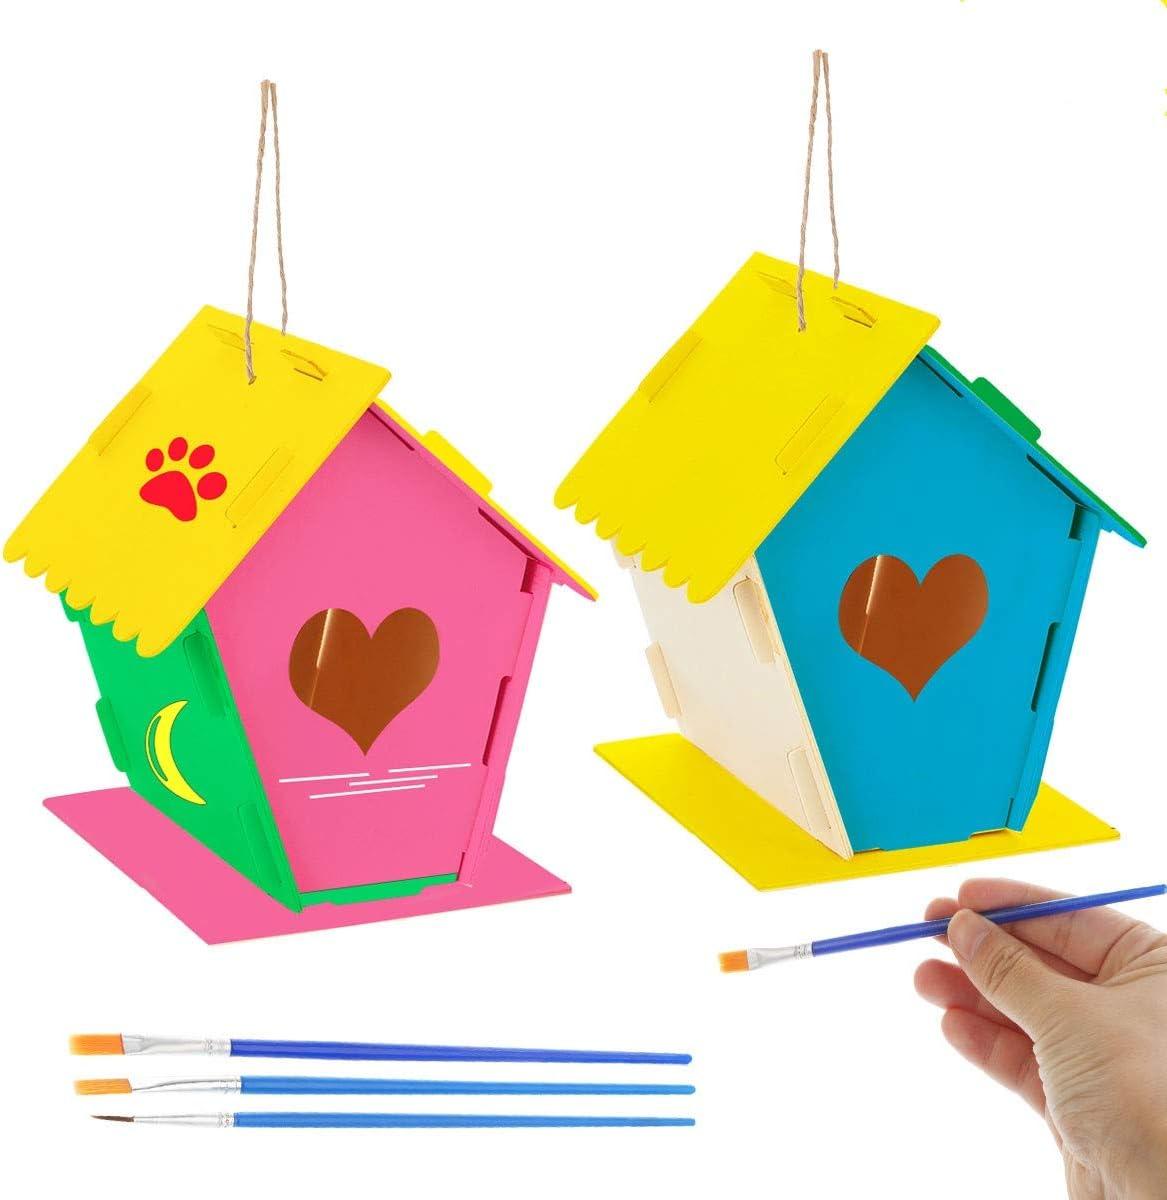 DIY Bird House Kit Design Your Own Wooden Birdhouses for Girls Boys Toddlers